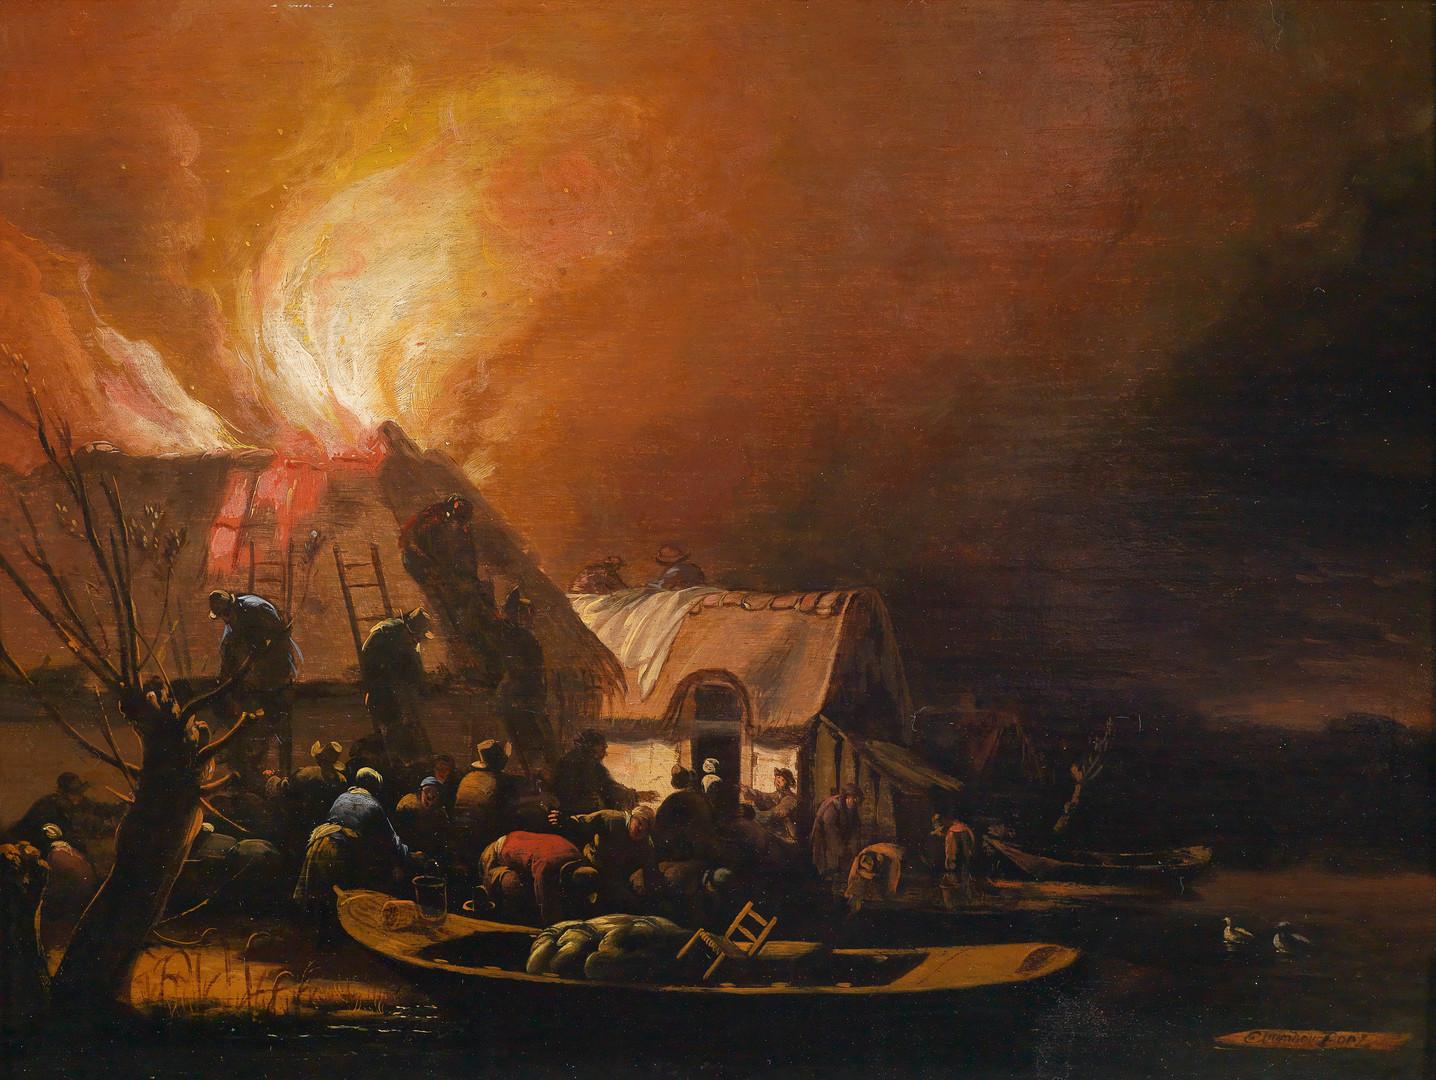 "Эгберт Ливенс ван дер Пул ""Ночной пожар в деревне у воды"", Вторая половина  1650-х Дерево (дуб), масло. 26 х 35 см"